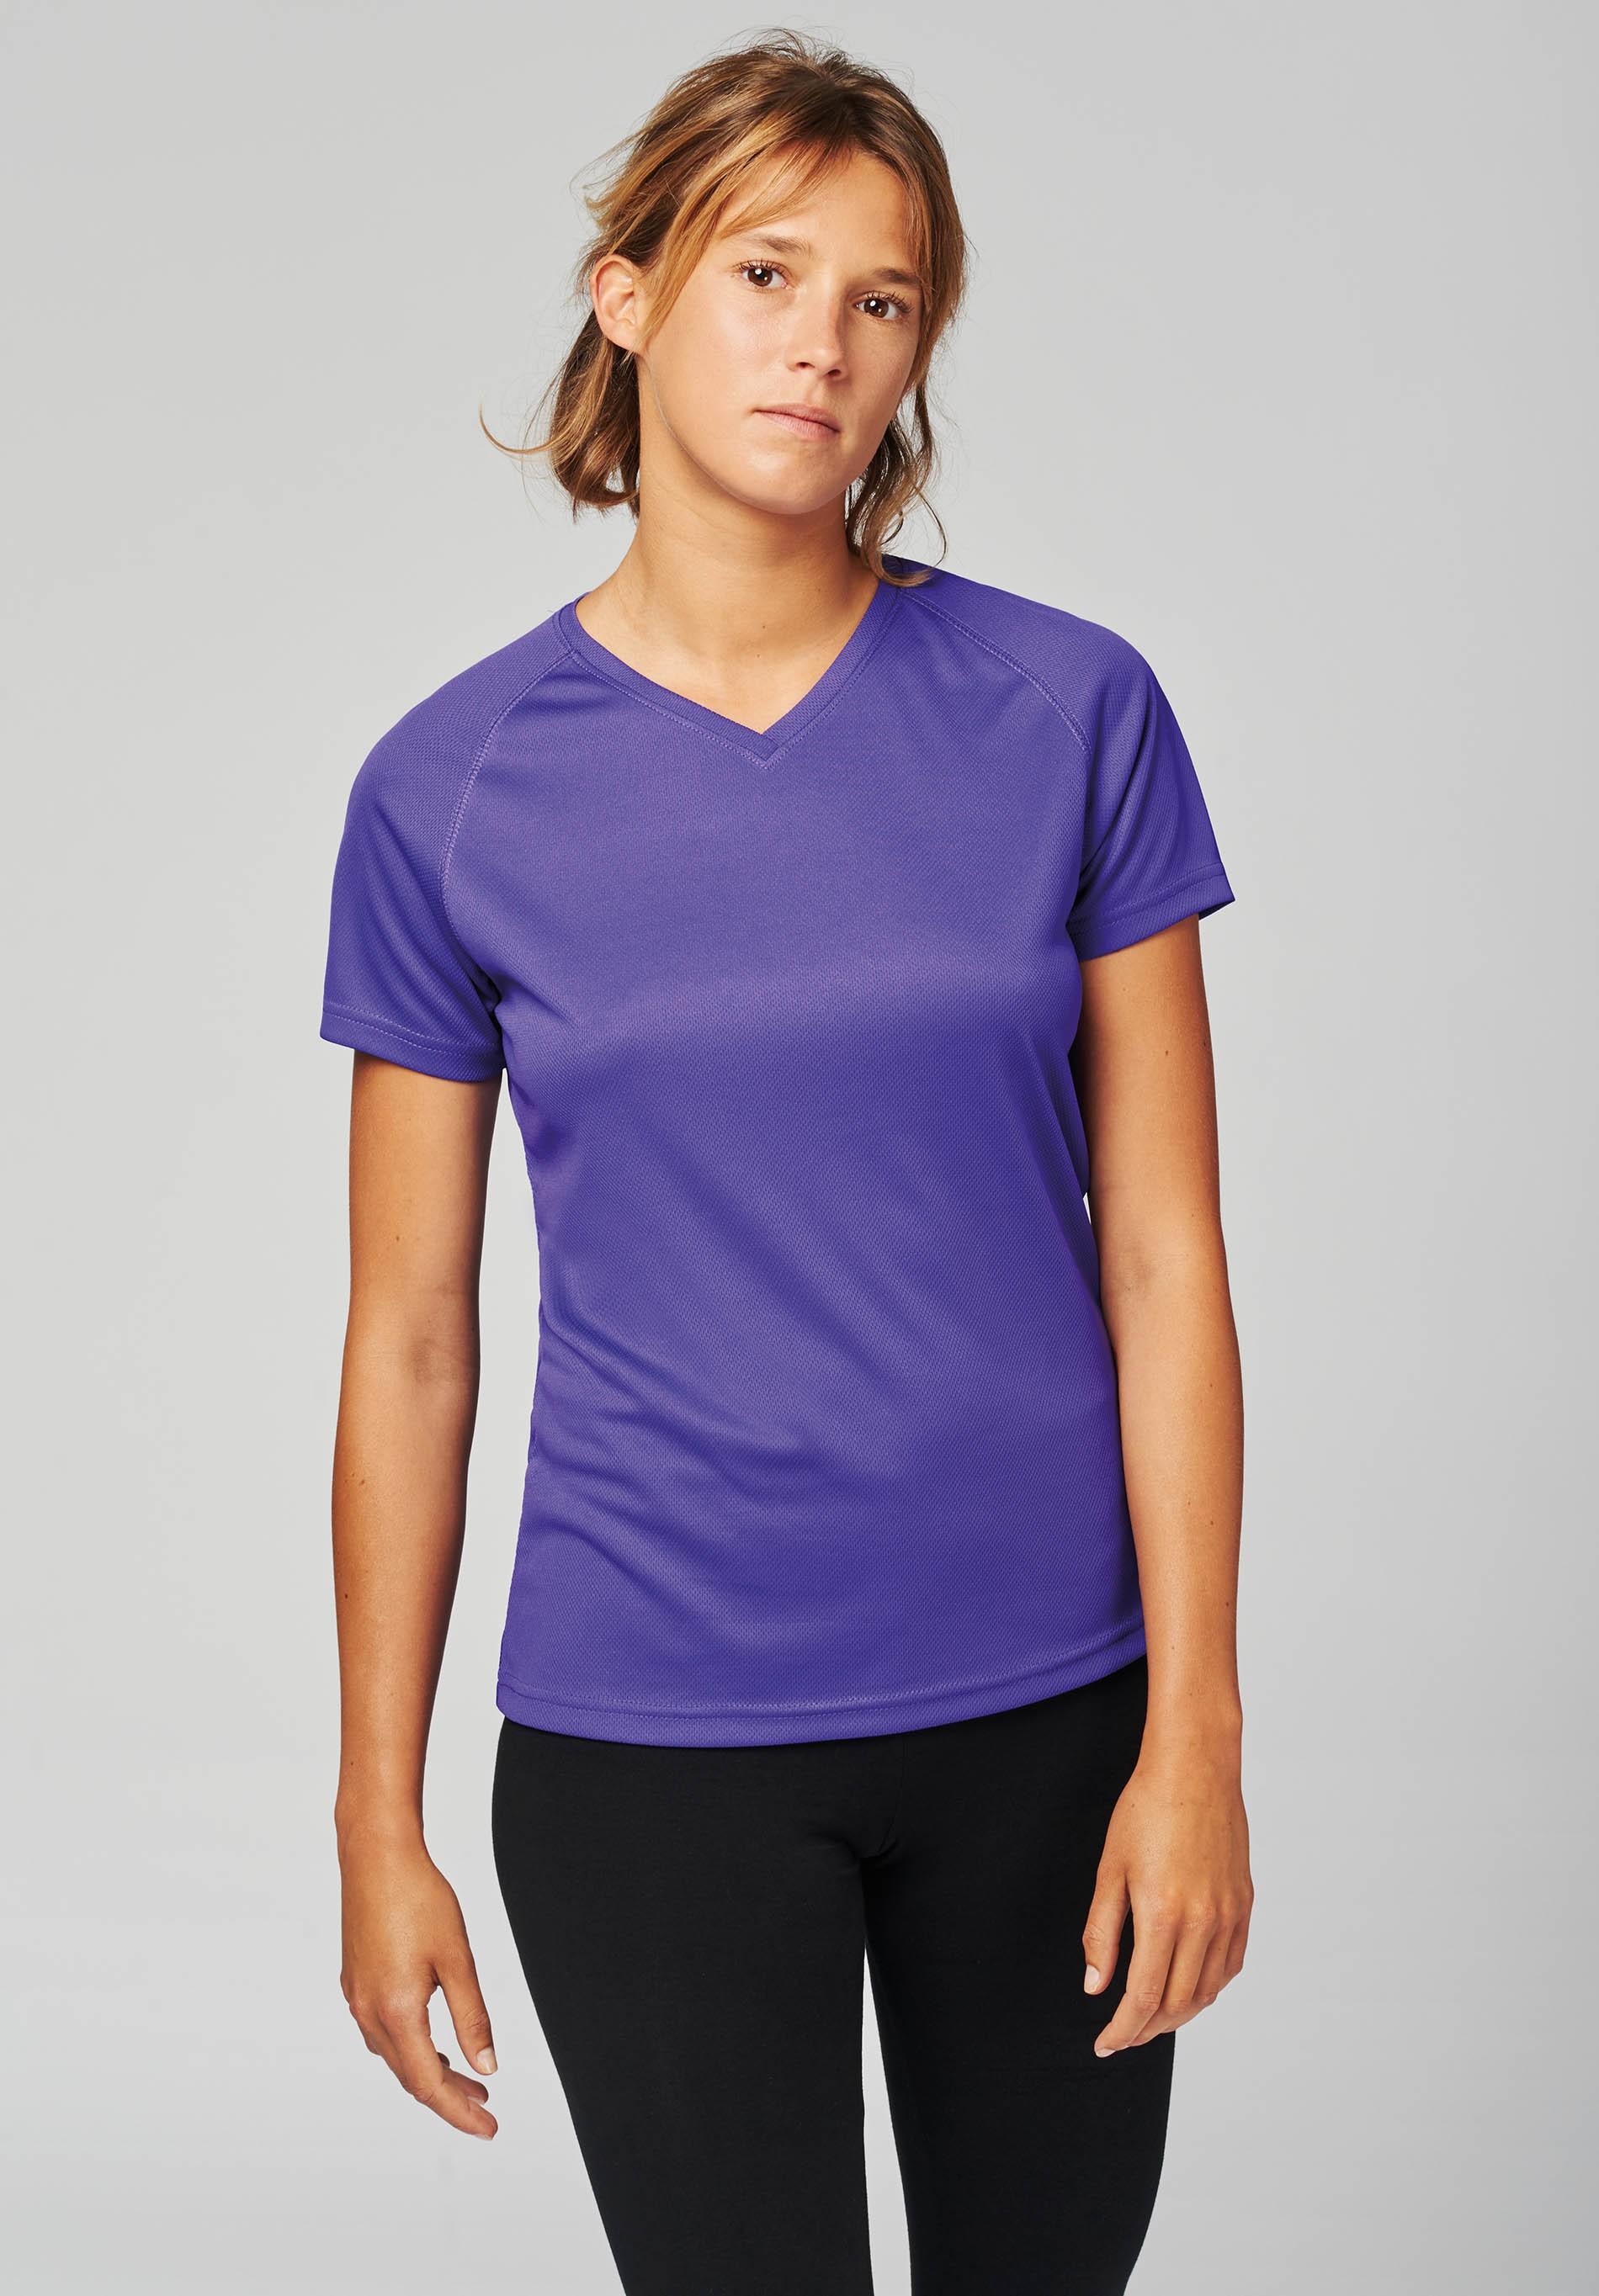 77a012b39983 T-shirt de sport manches courtes col v femme - Polyester Sport - T ...